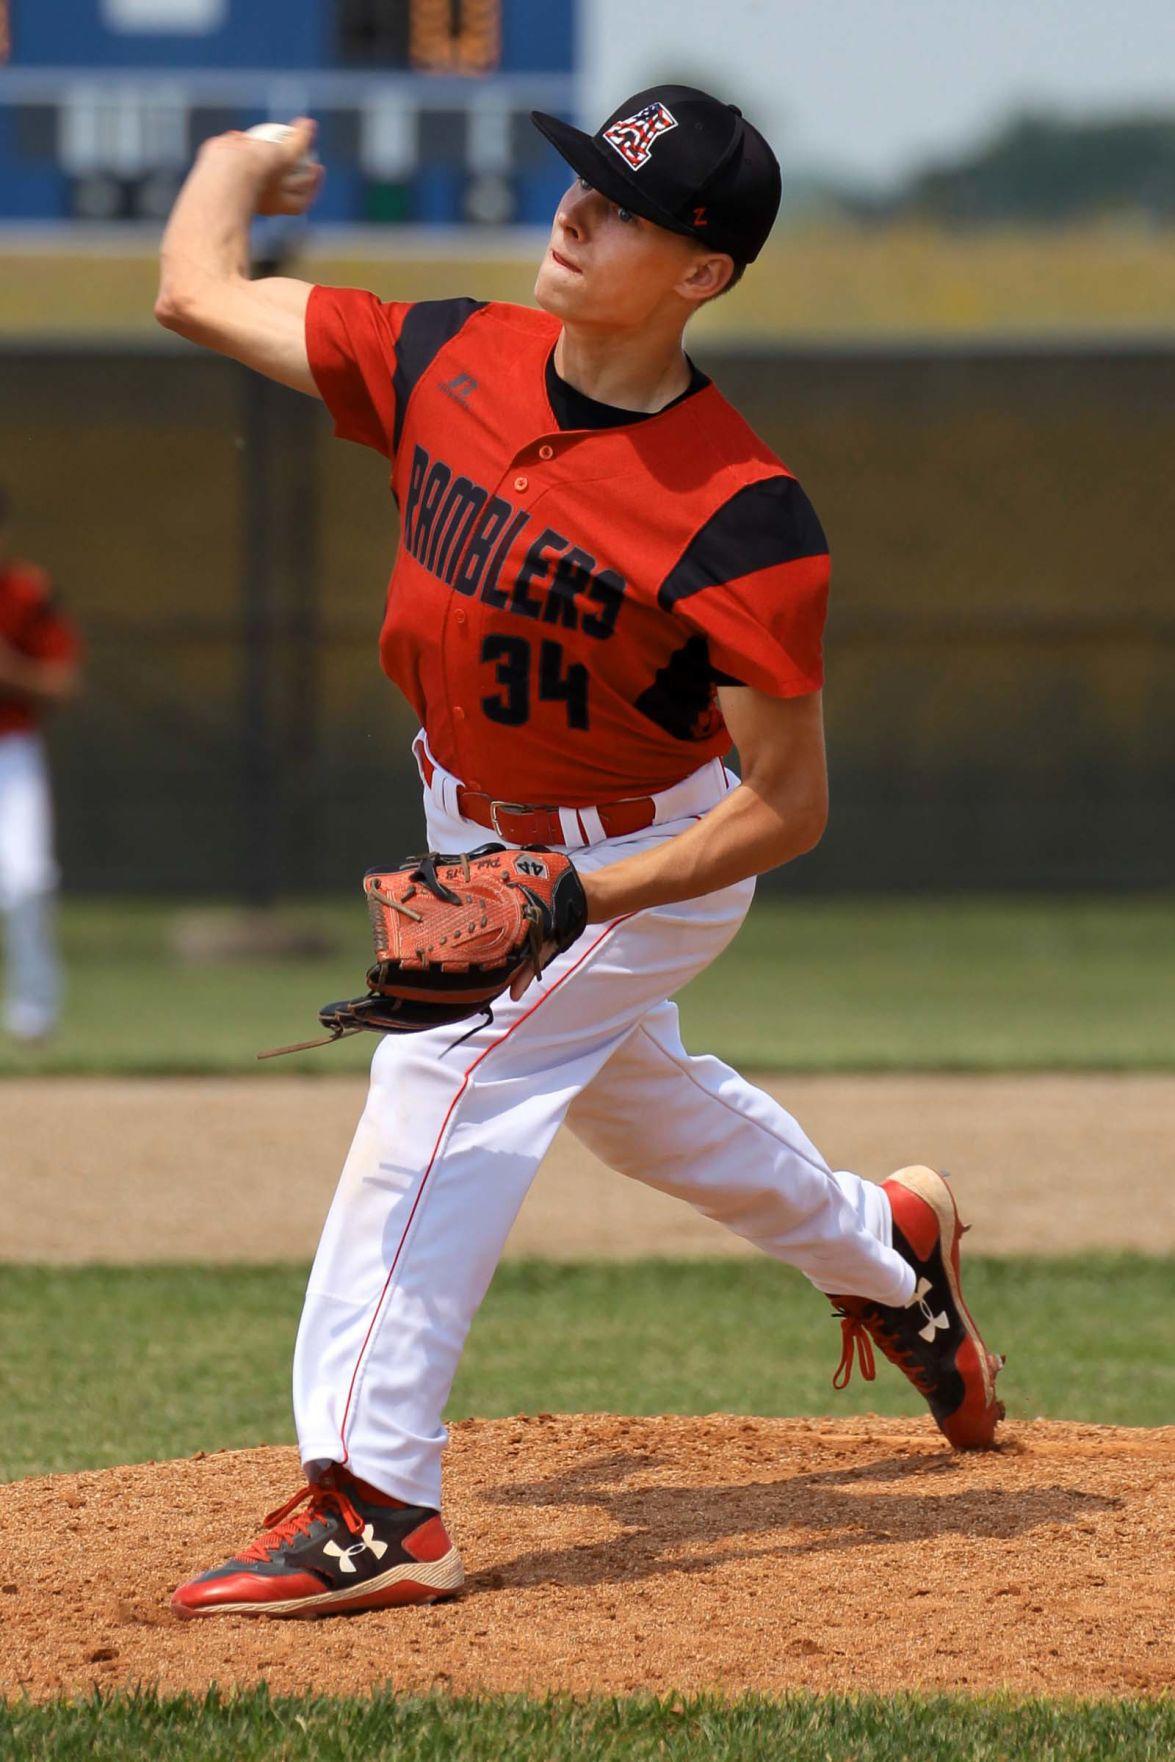 base_att_burris_pitching.jpg